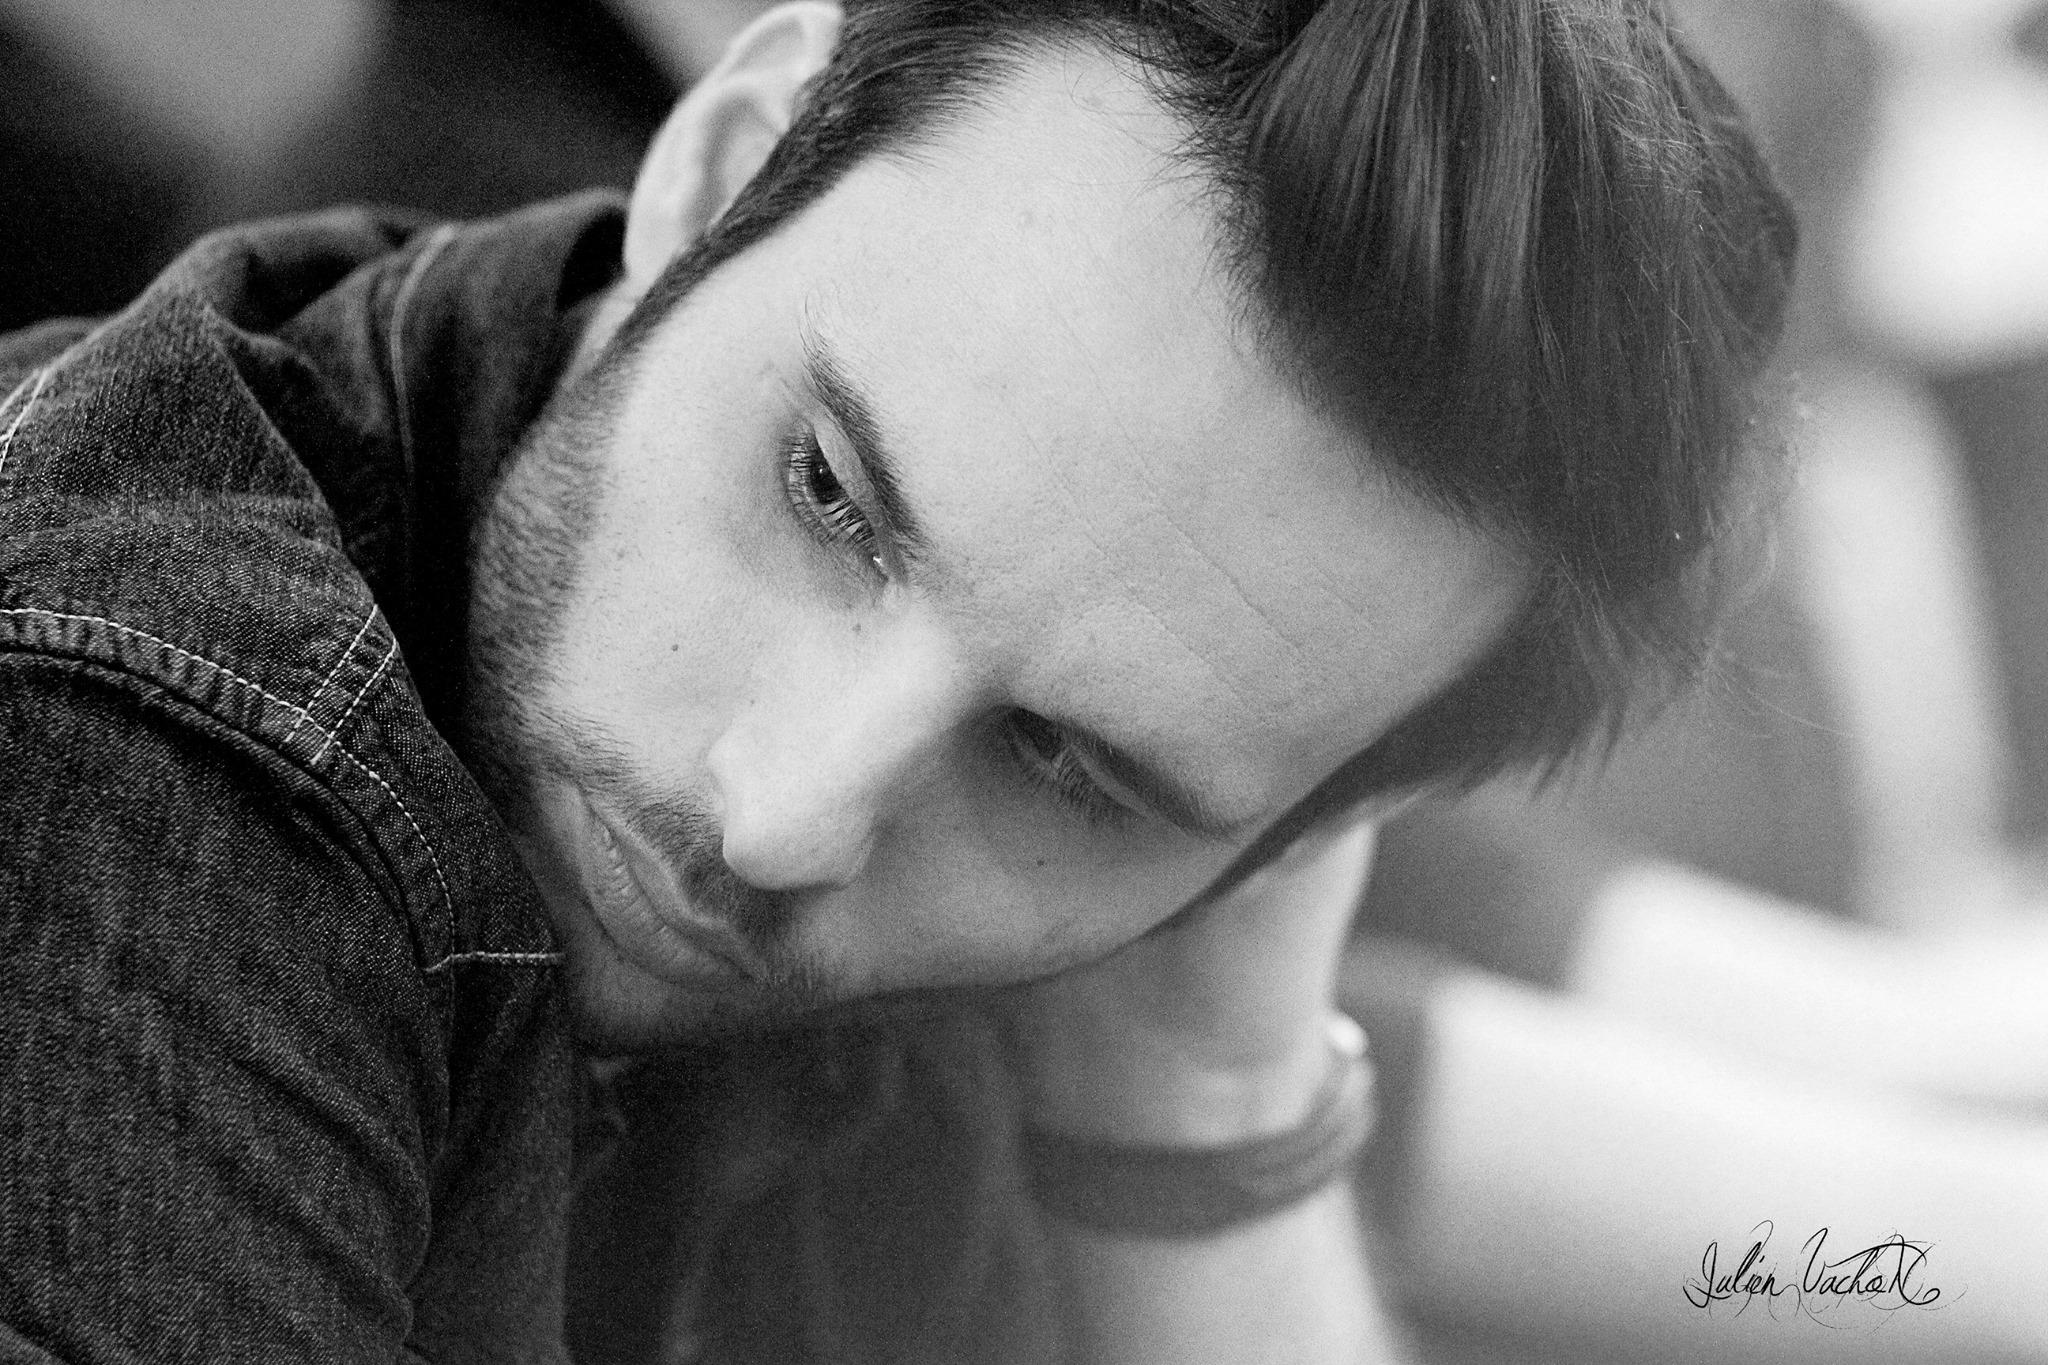 Christophe Caron – IDFM Radio Enghien